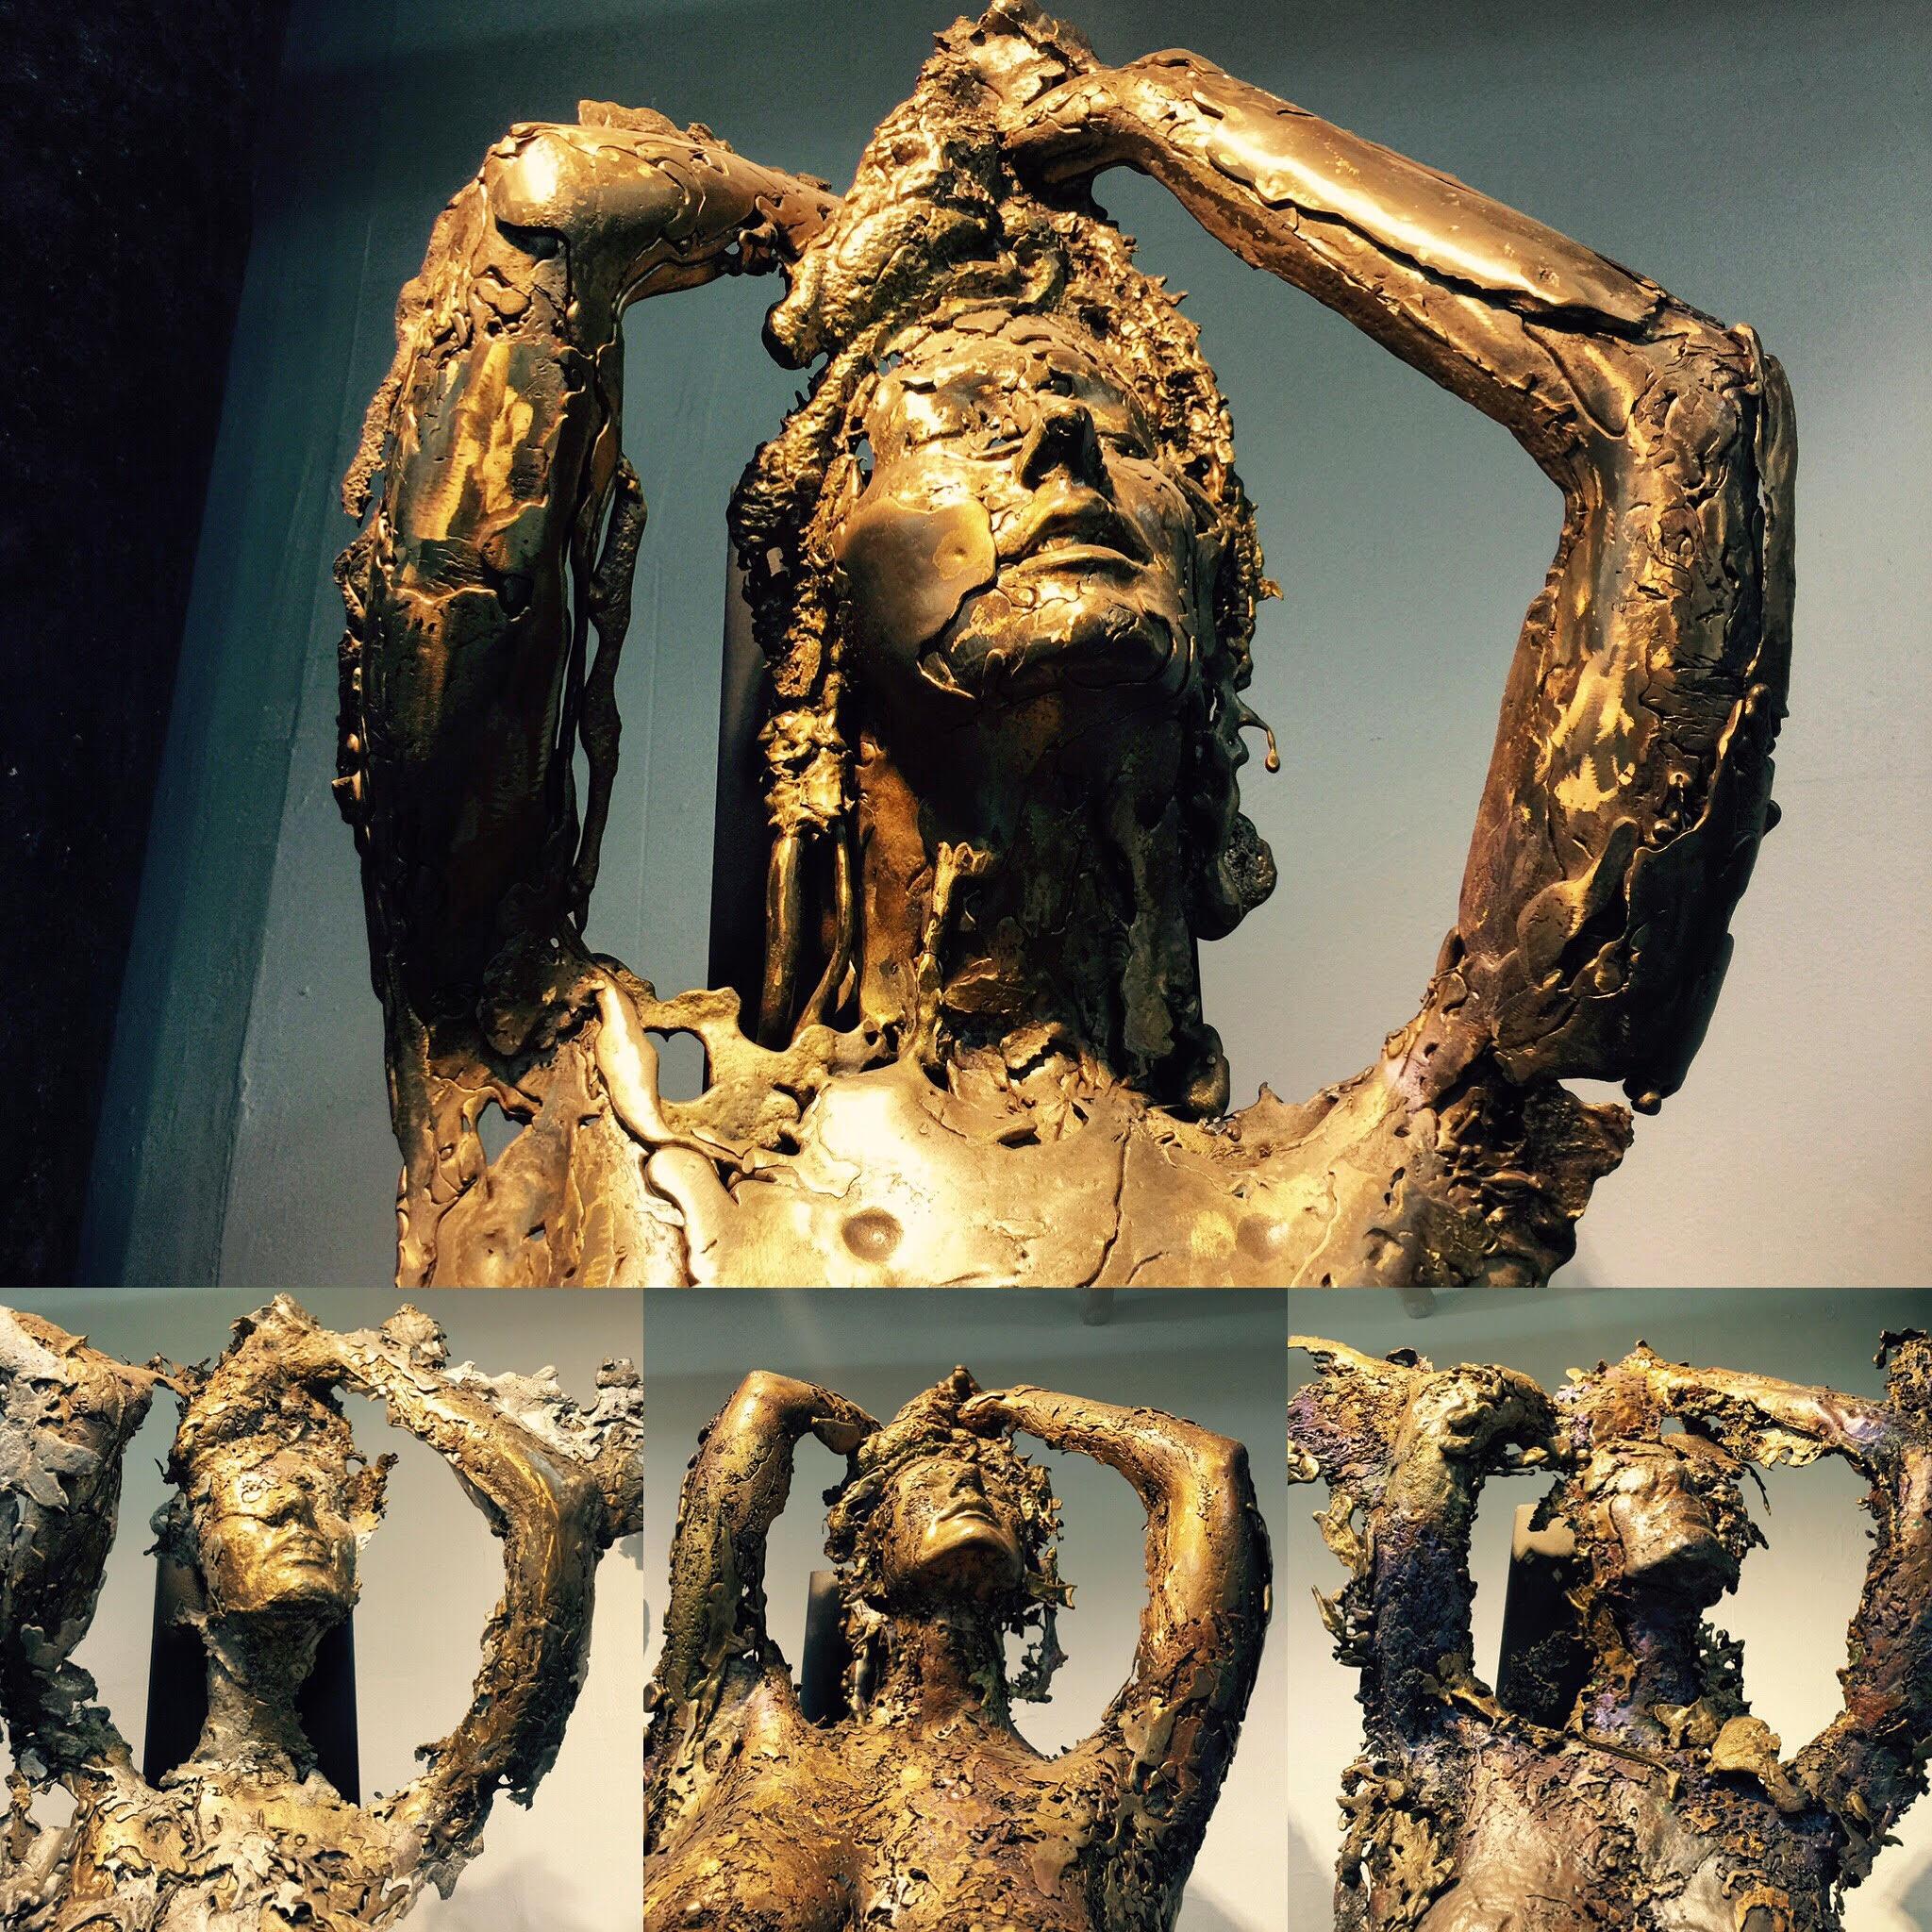 Asia,   1999. Bronze. 83 x 31 x 15 inches.